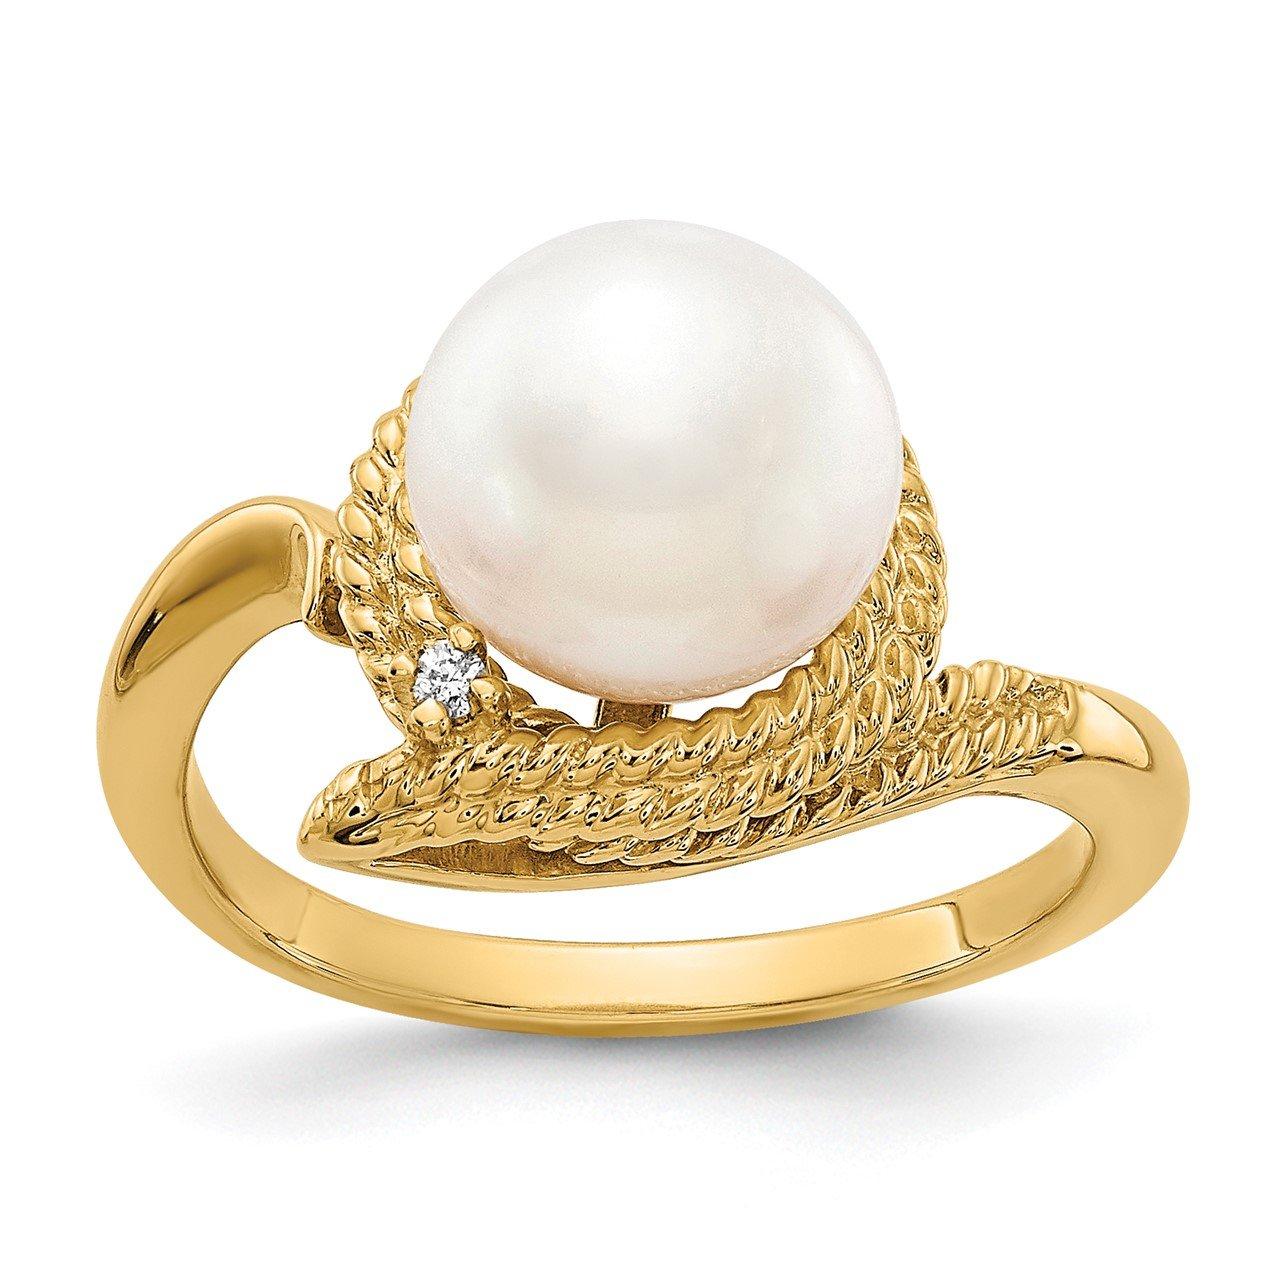 14k 8.5mm FW Cultured Pearl AA Diamond ring